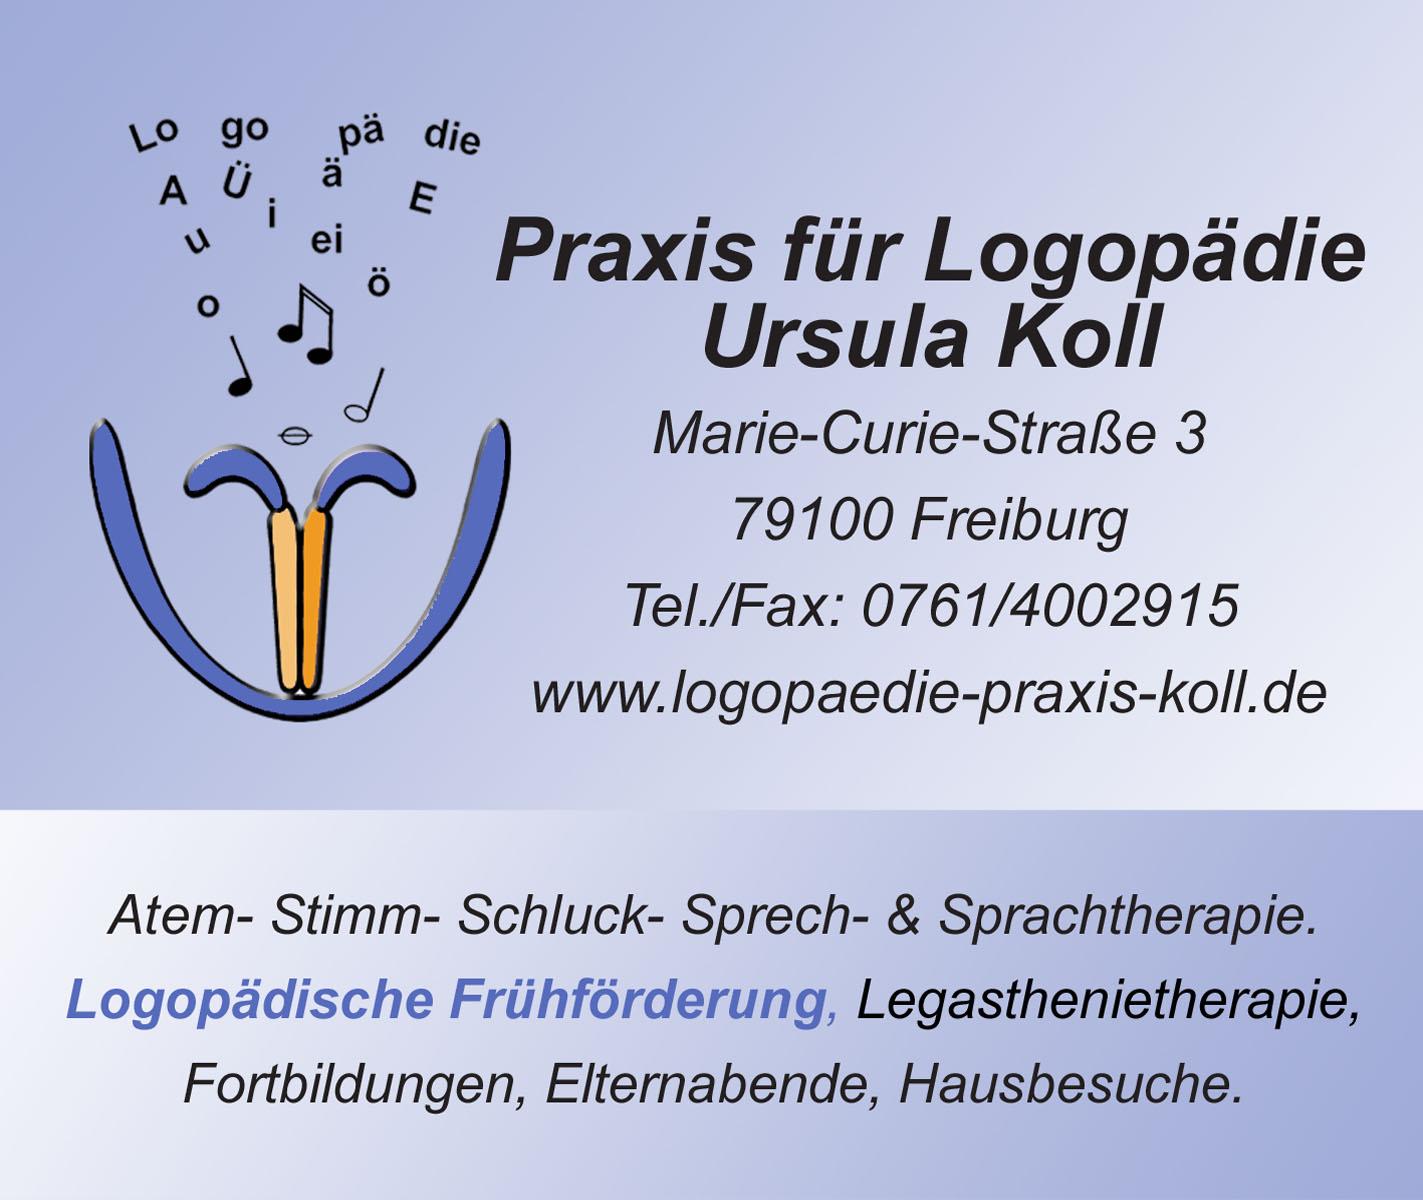 Praxis für Logopädie, Ursula Koll